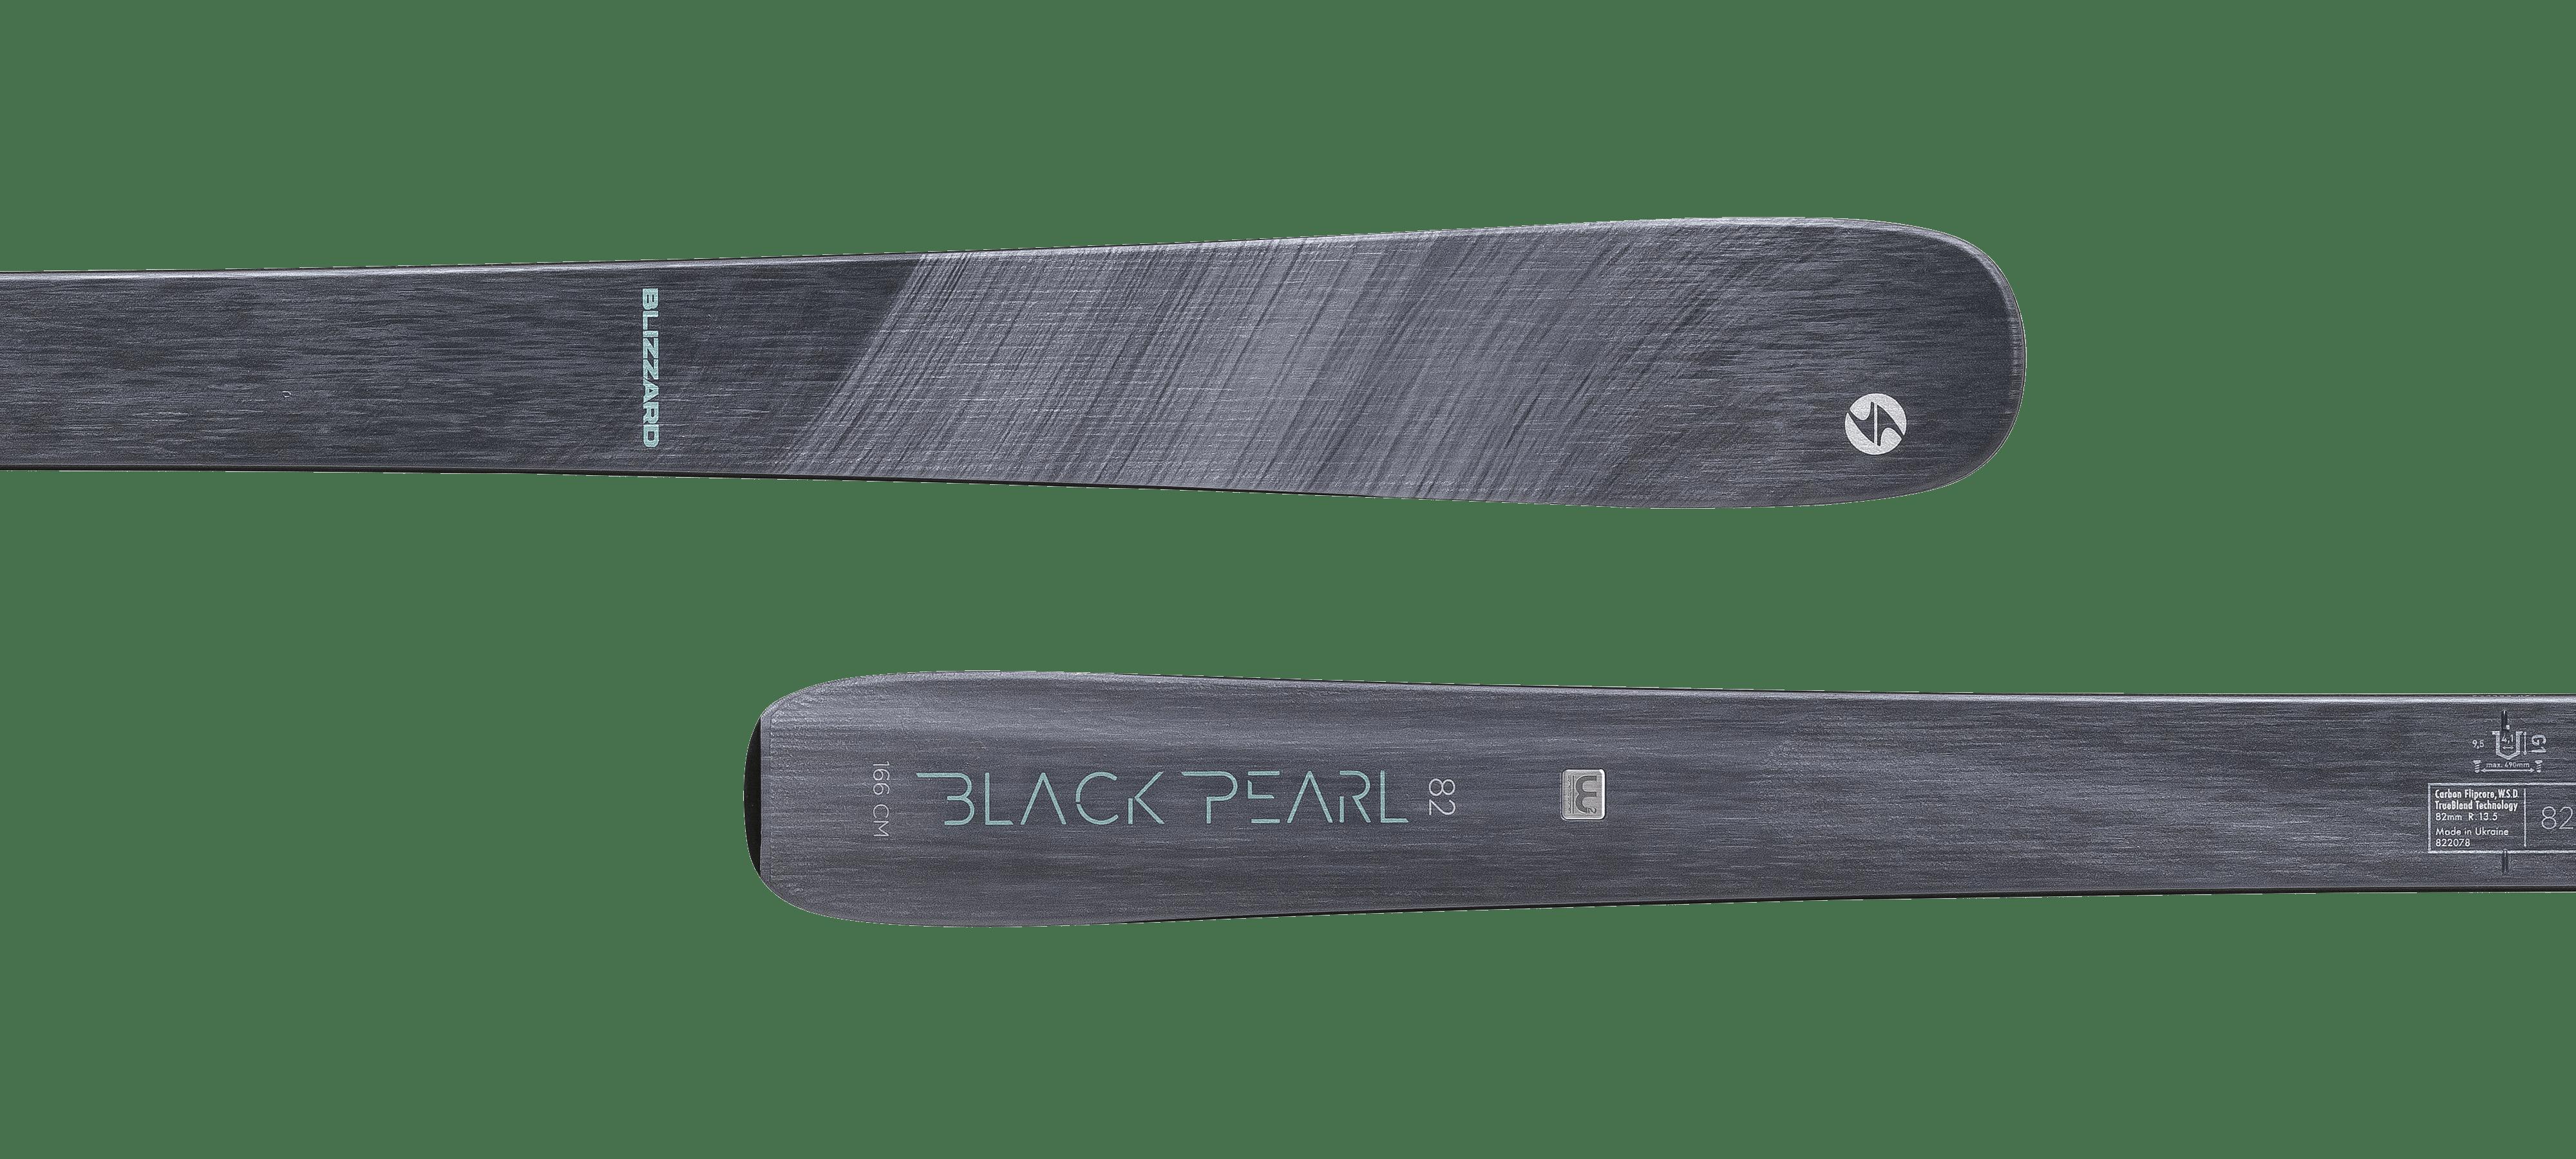 BLACK PEARL 82